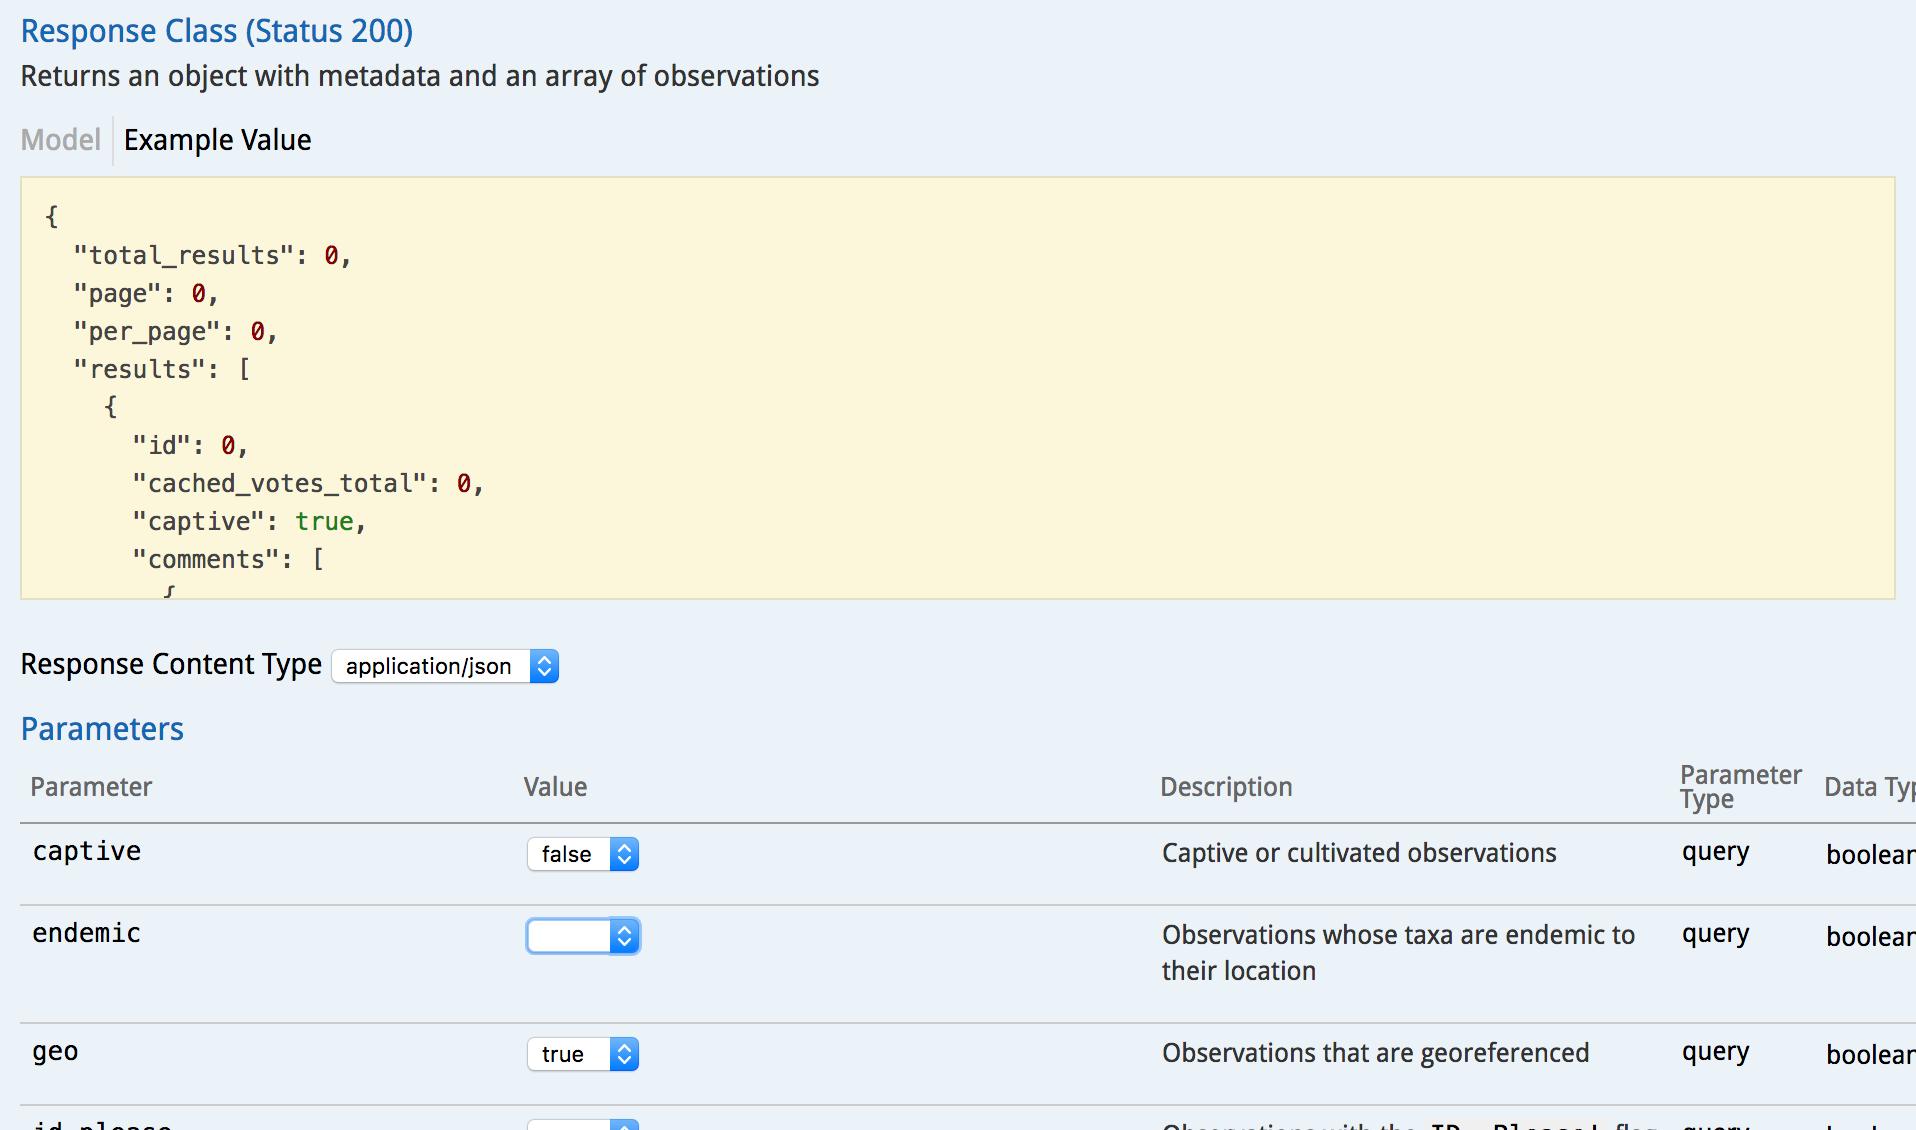 screenshot of iNaturalist API explorer